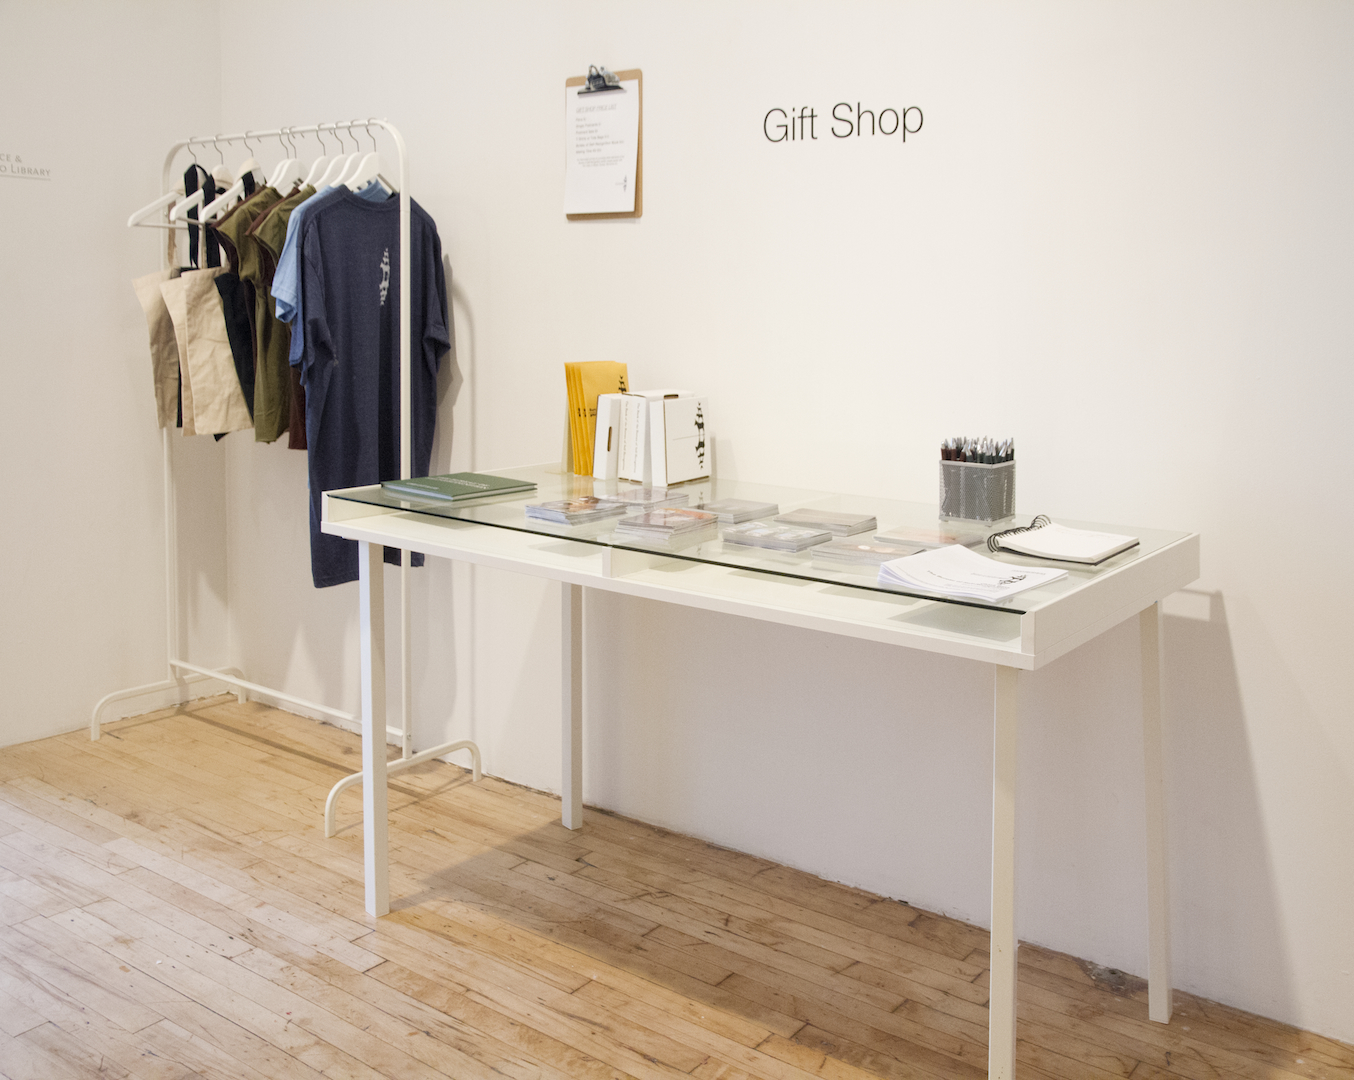 Installation View: Gift Shop